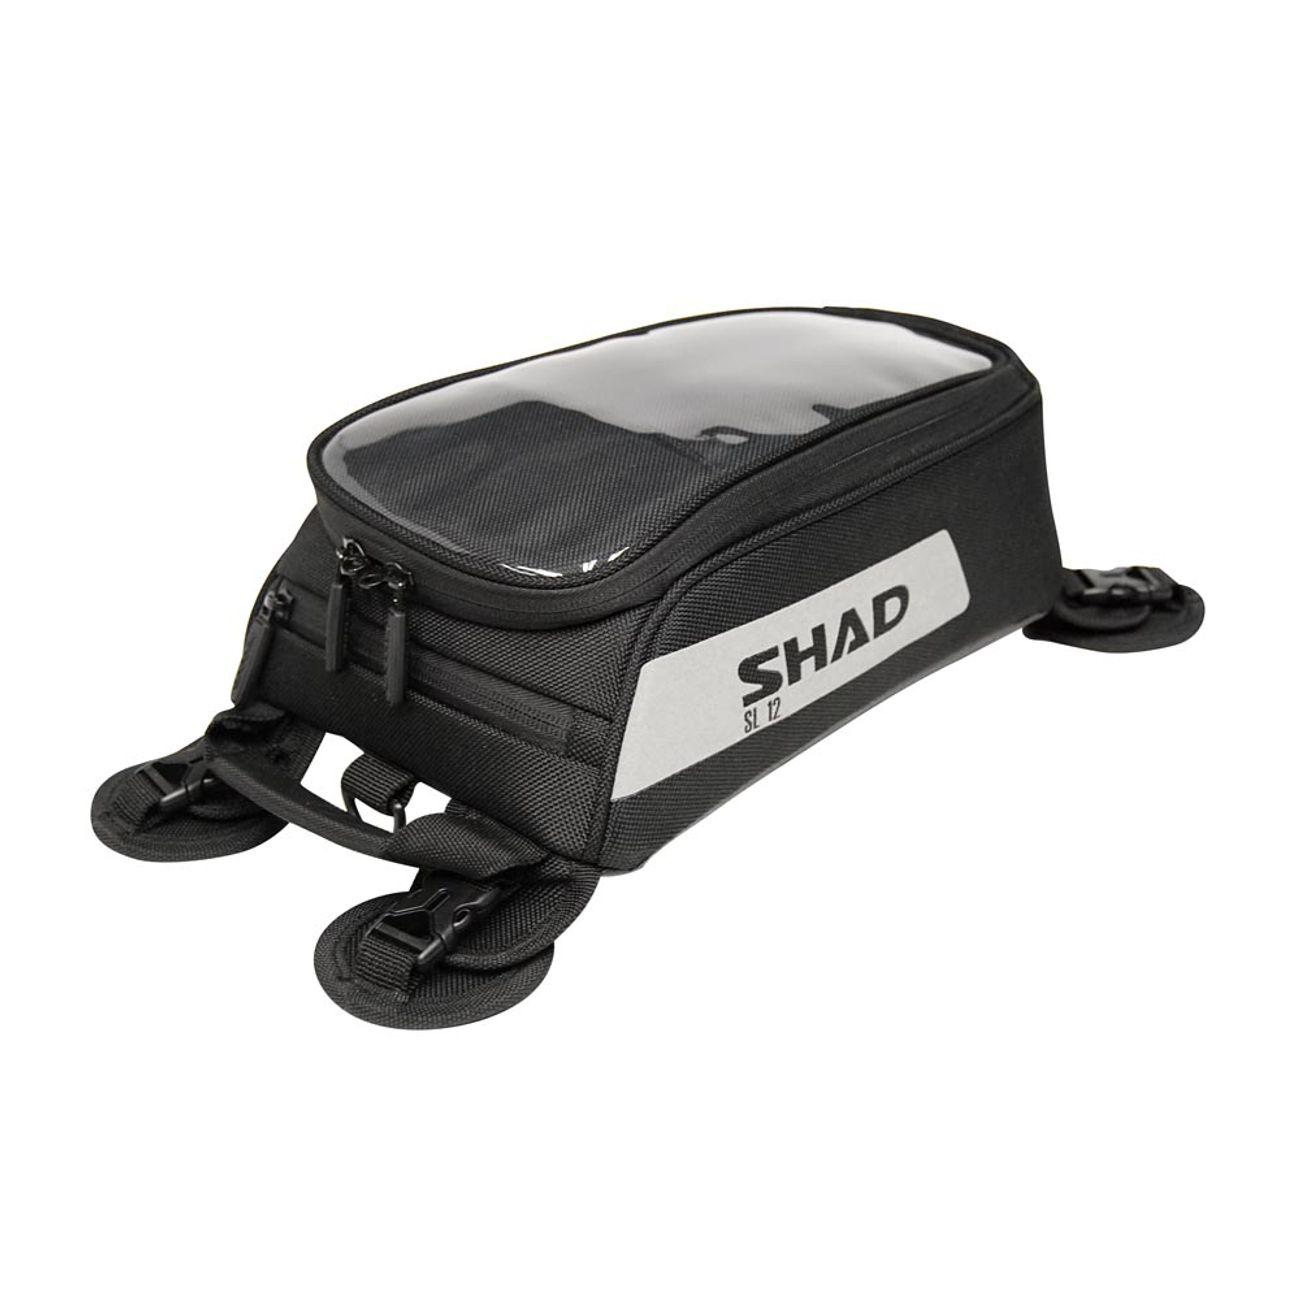 Shad Bagagerie Bag Magnets Sl12m Tank Small lFJ5K1cuT3